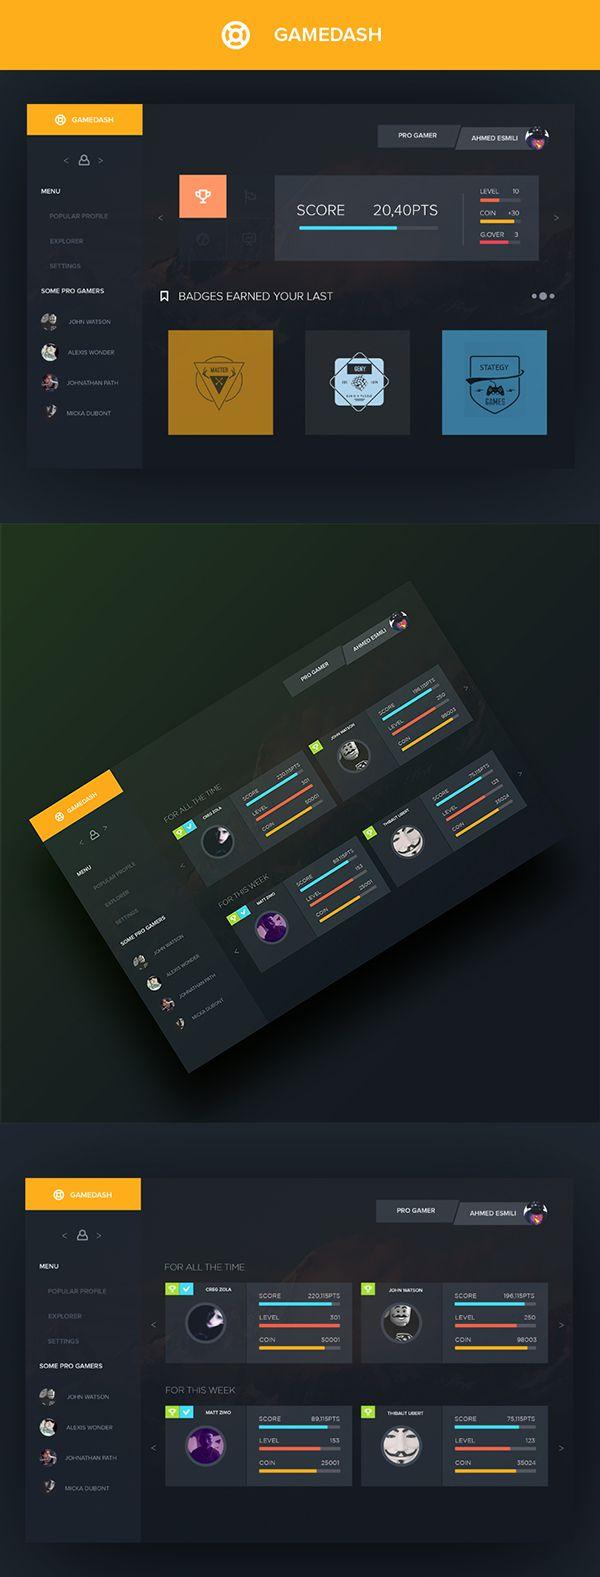 GAMEDASH UI on Behance